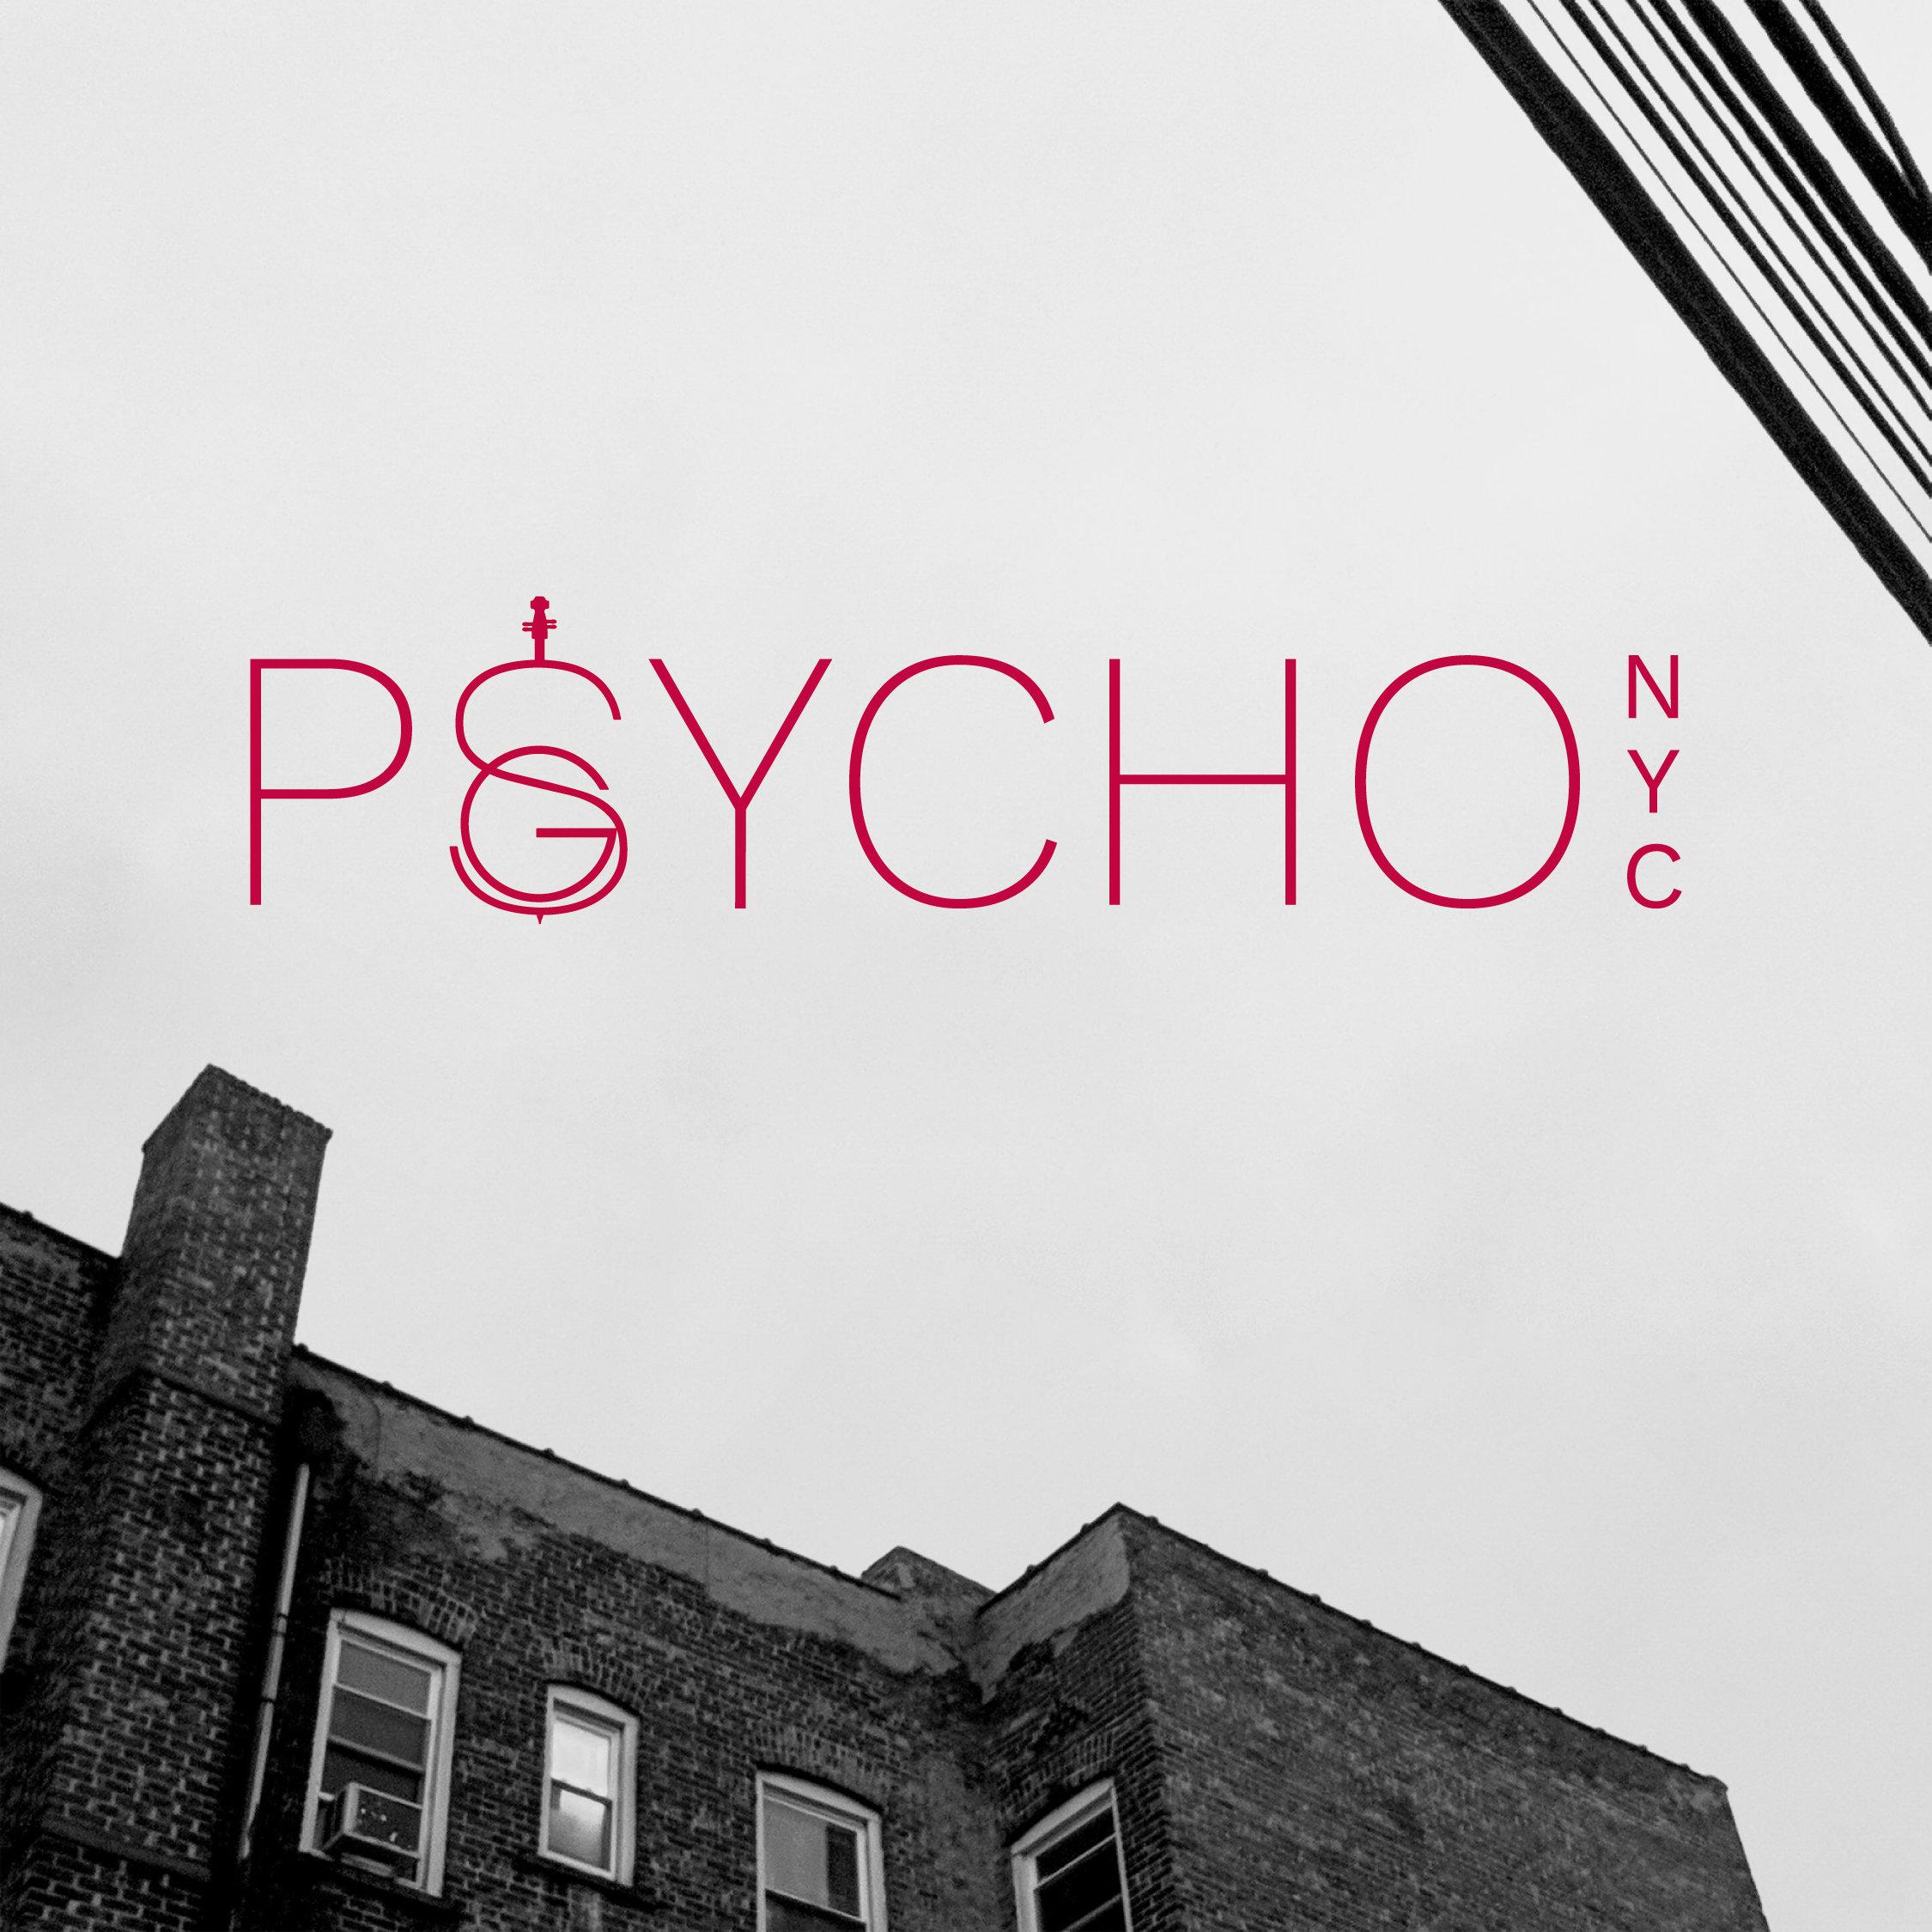 4/13 Psycho NYC RSVP 00004